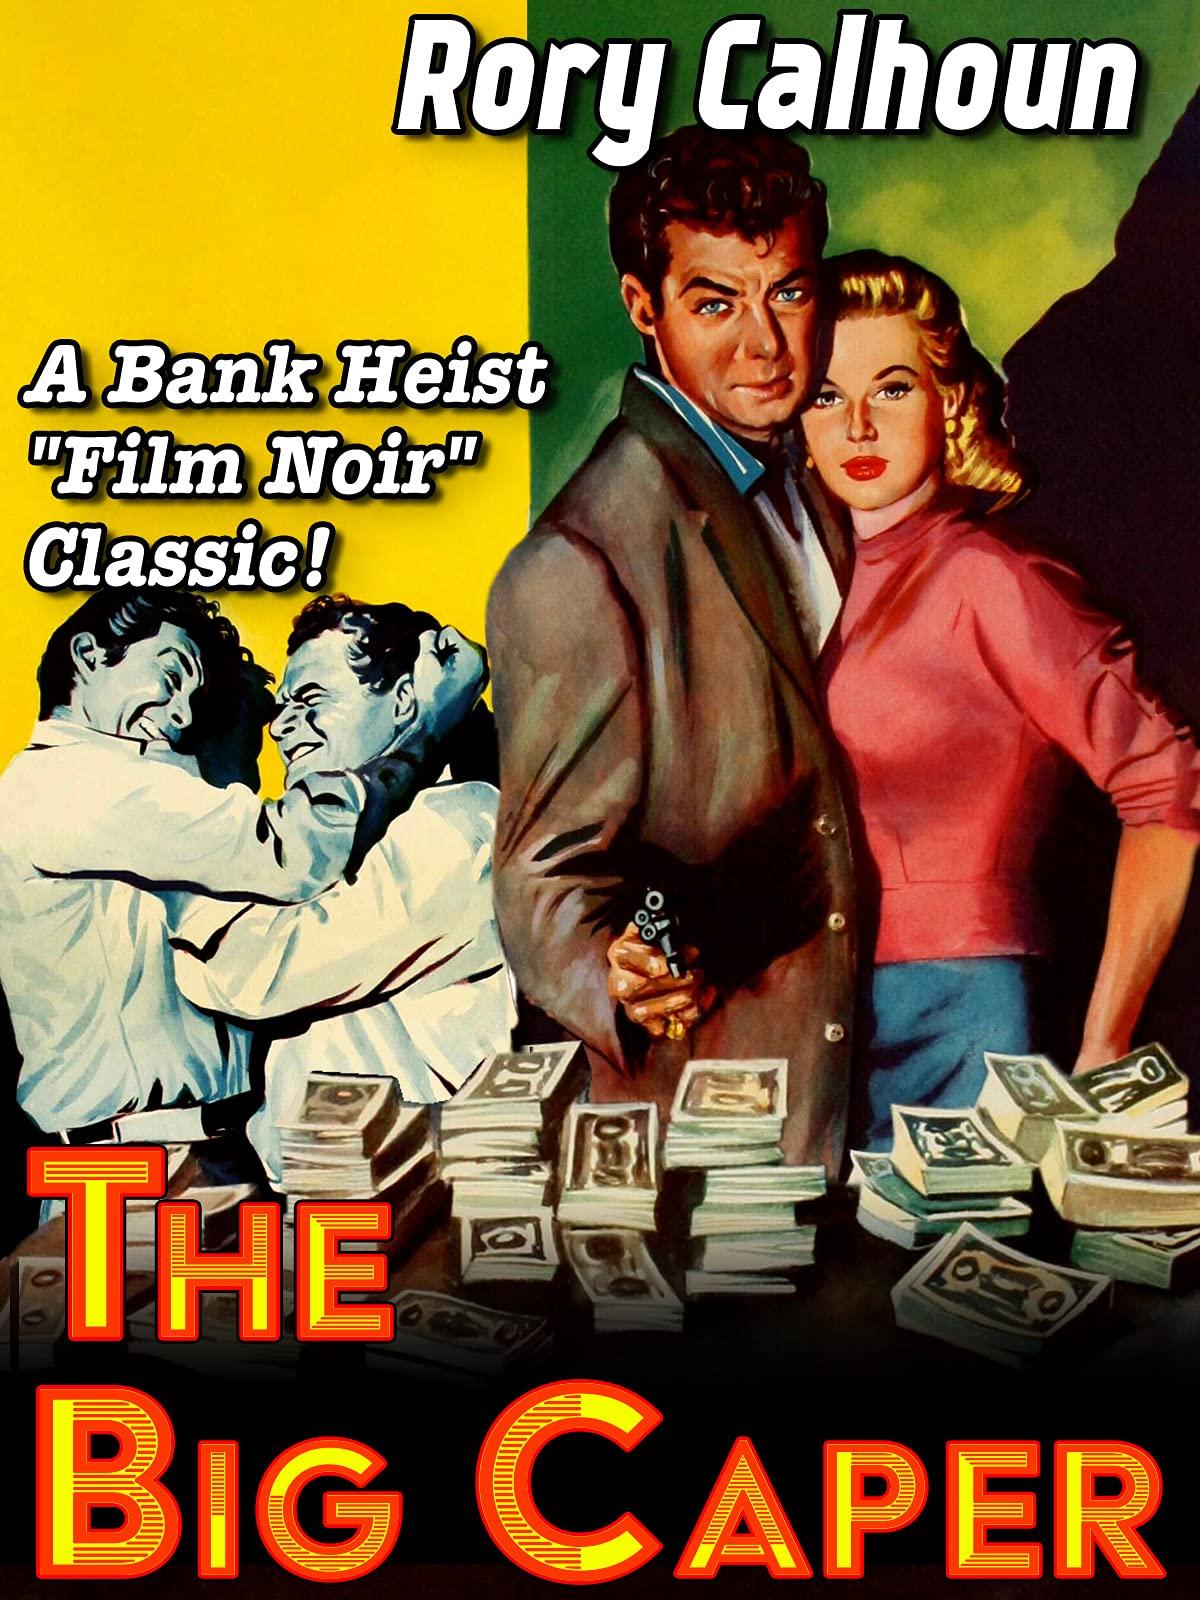 "Rory Calhoun in ""The Big Caper"" - A Bank Heist Film Noir Classic!"